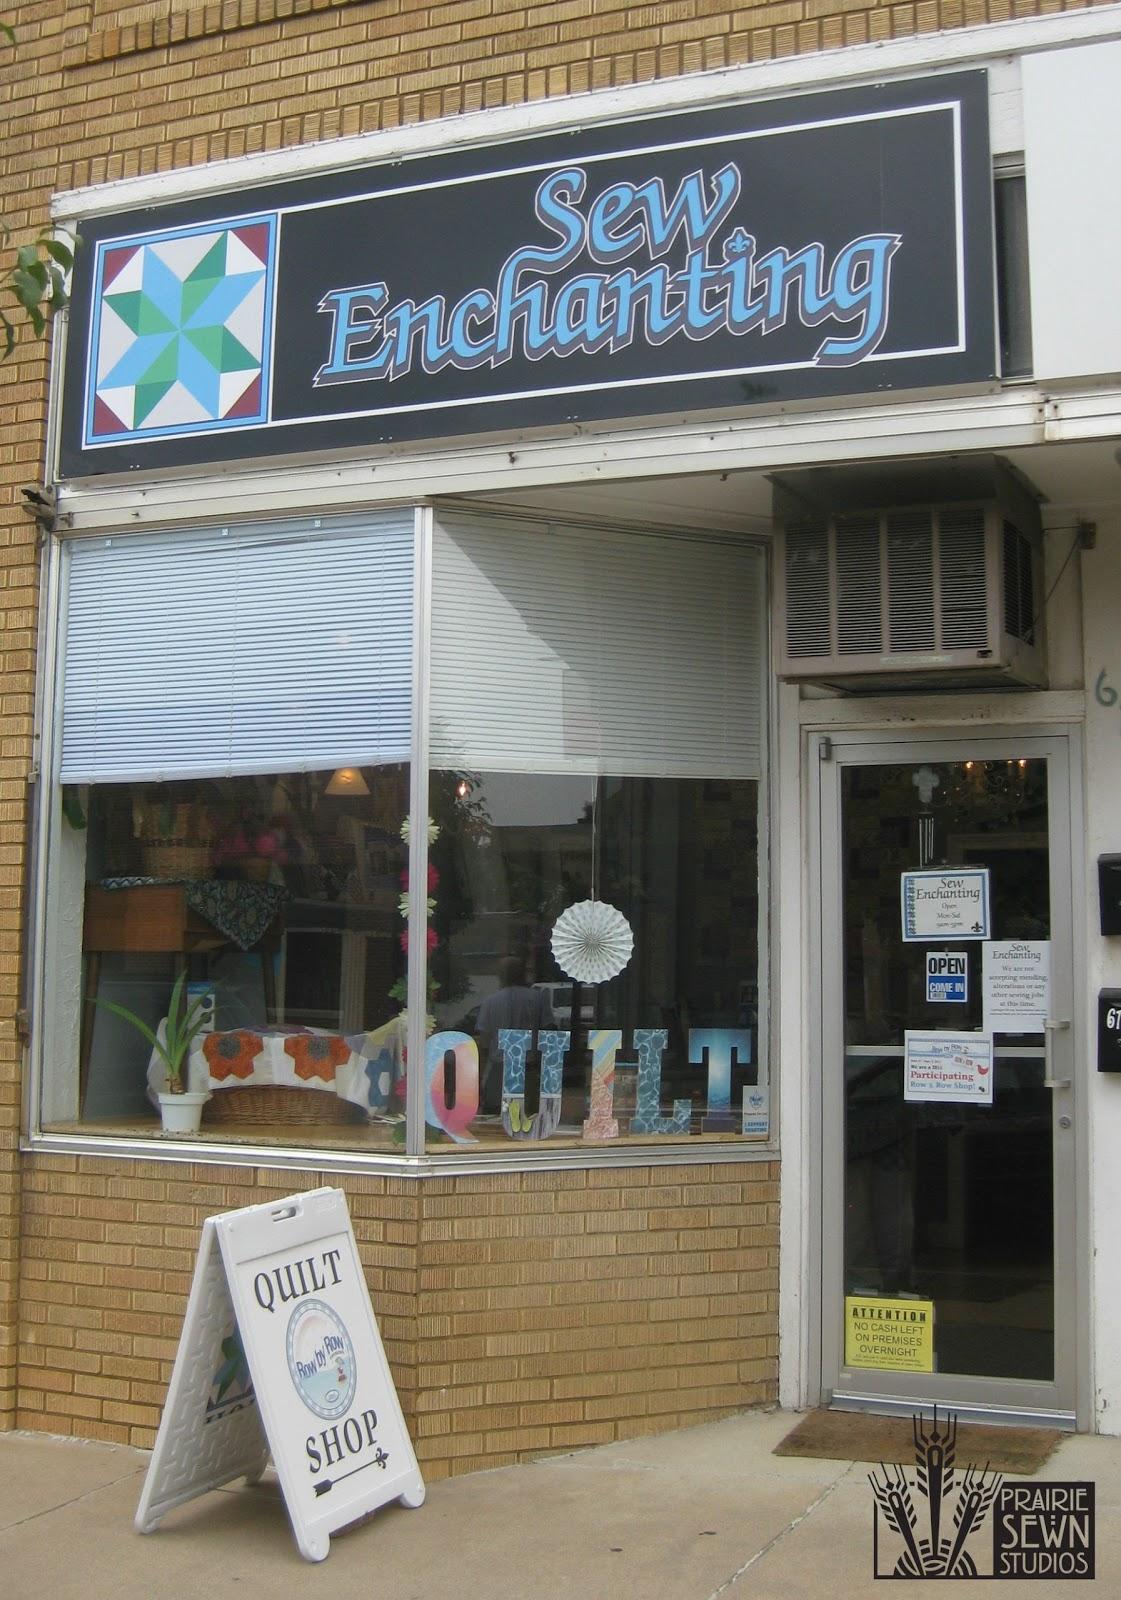 Sew Enchanting Quilt Shop